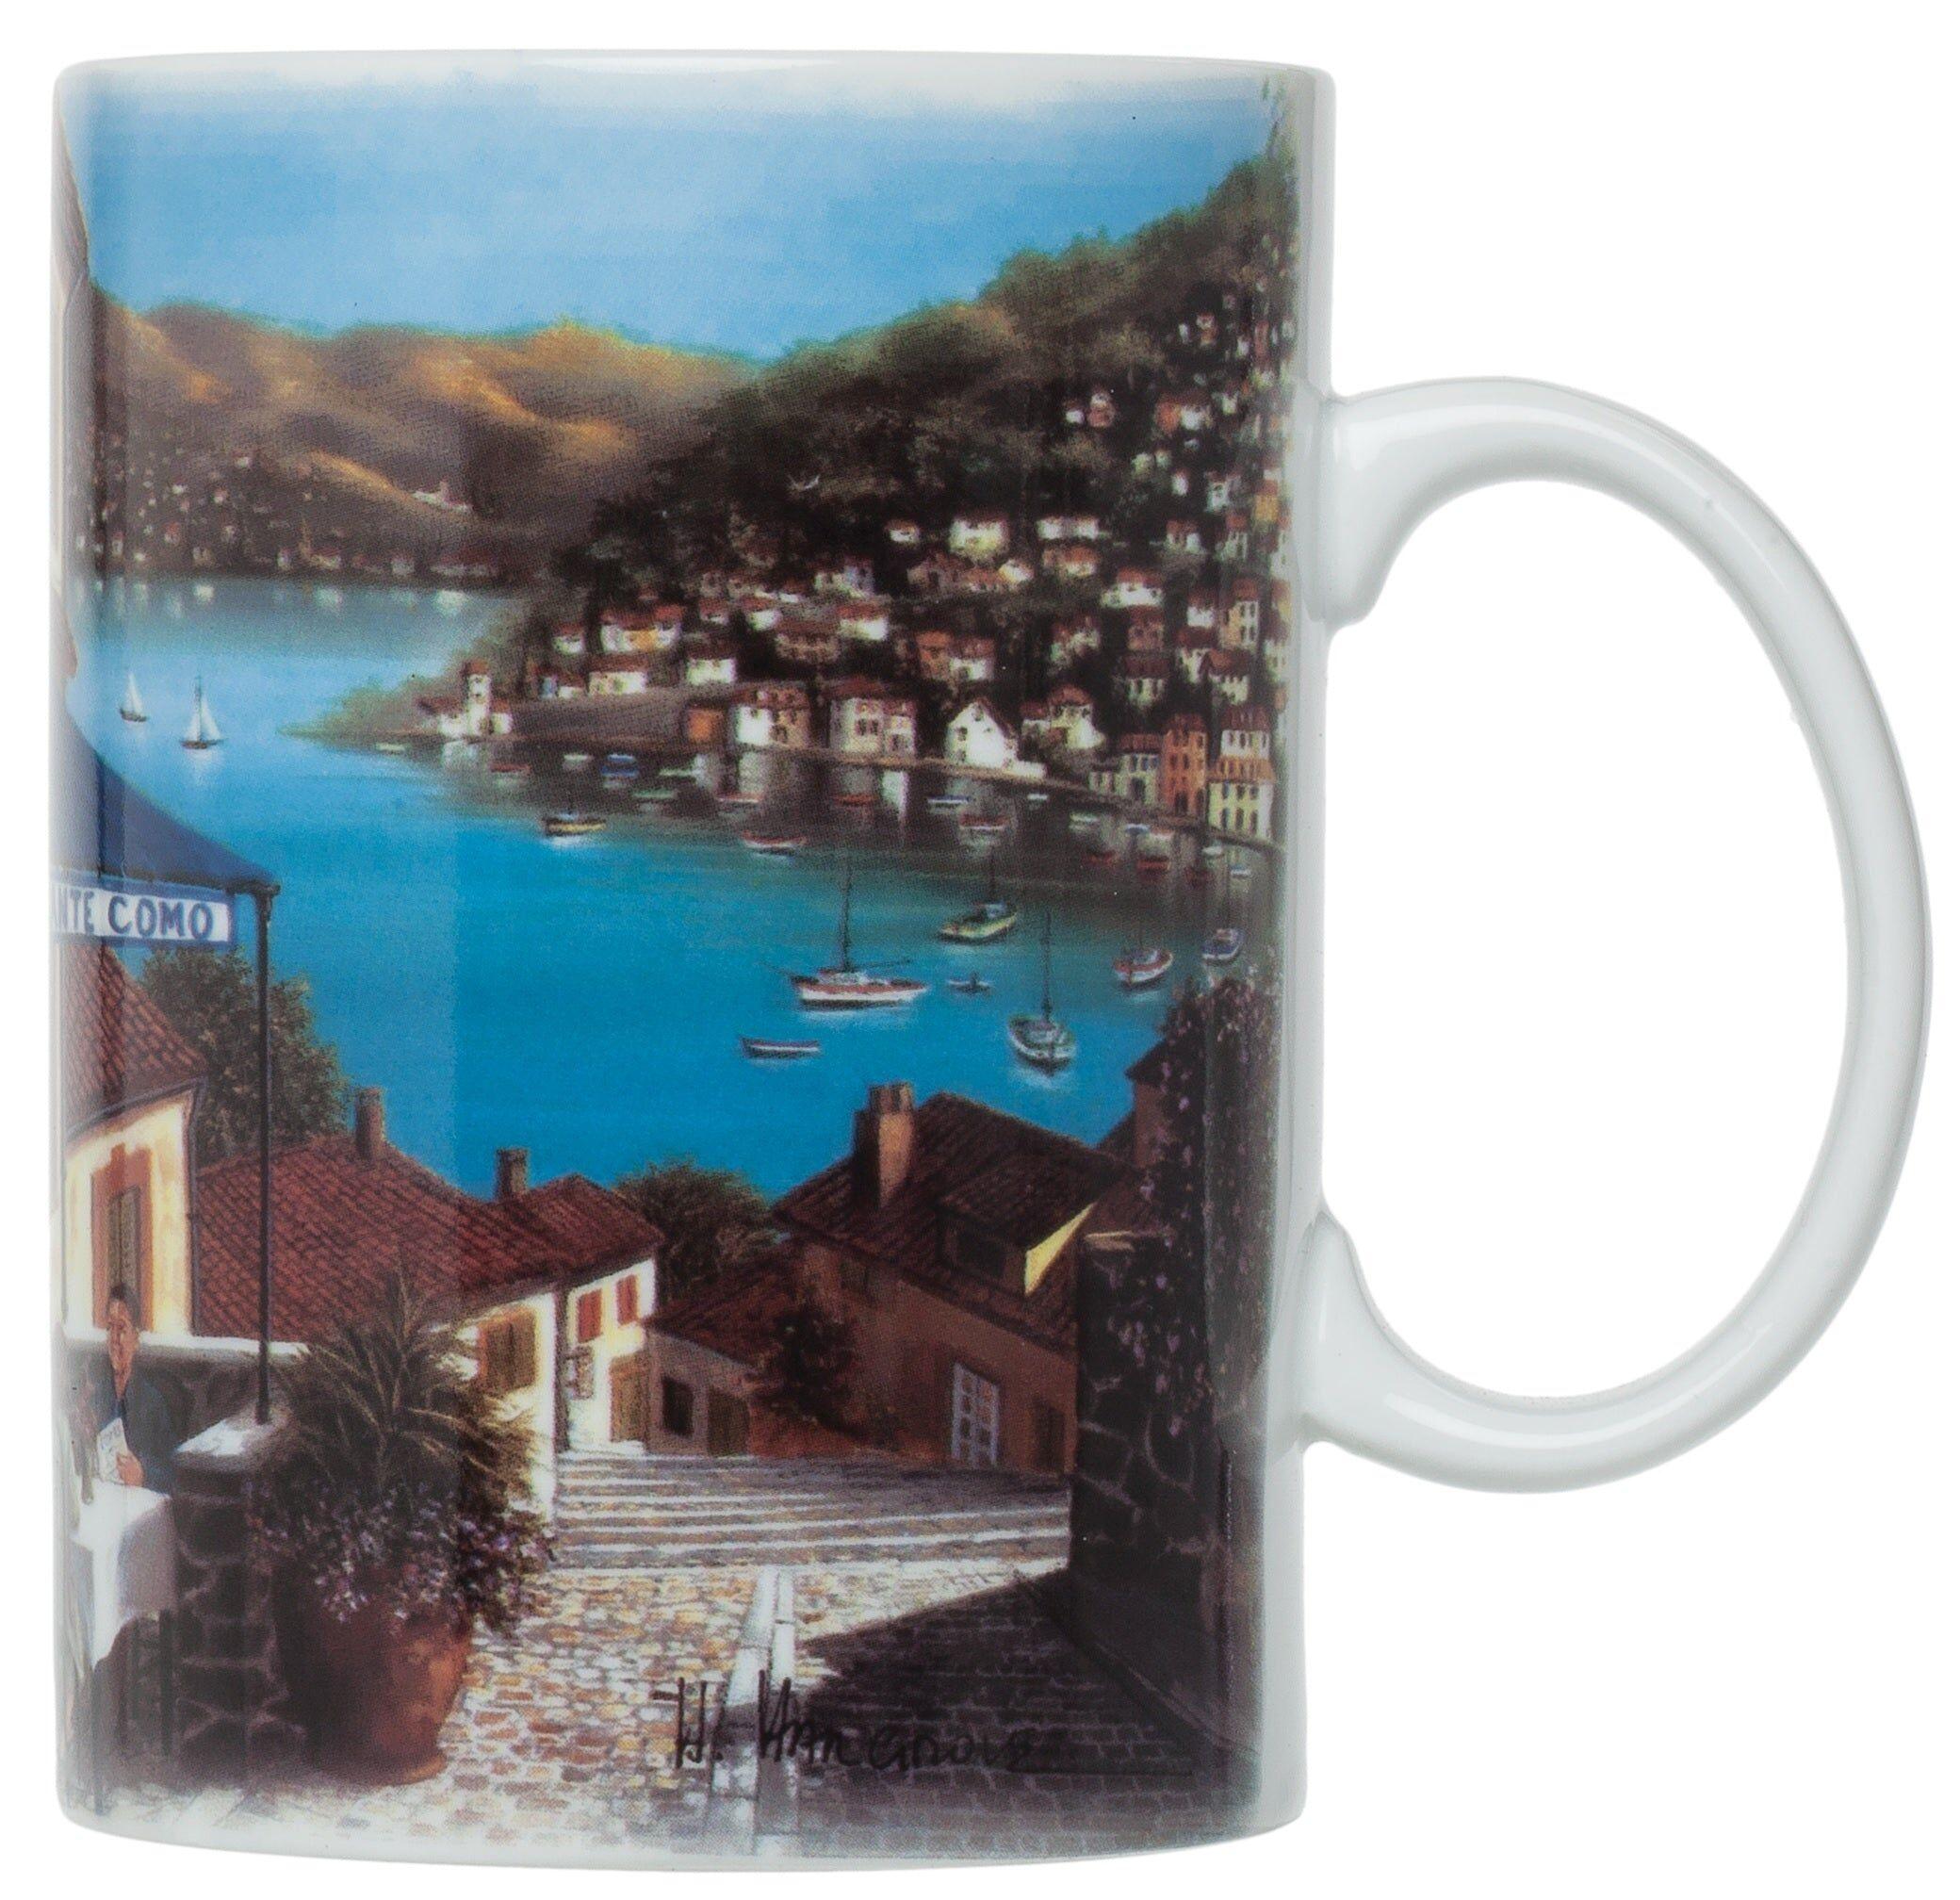 Harold Import Nt789 Ristorante Com Mugs, 16 Oz